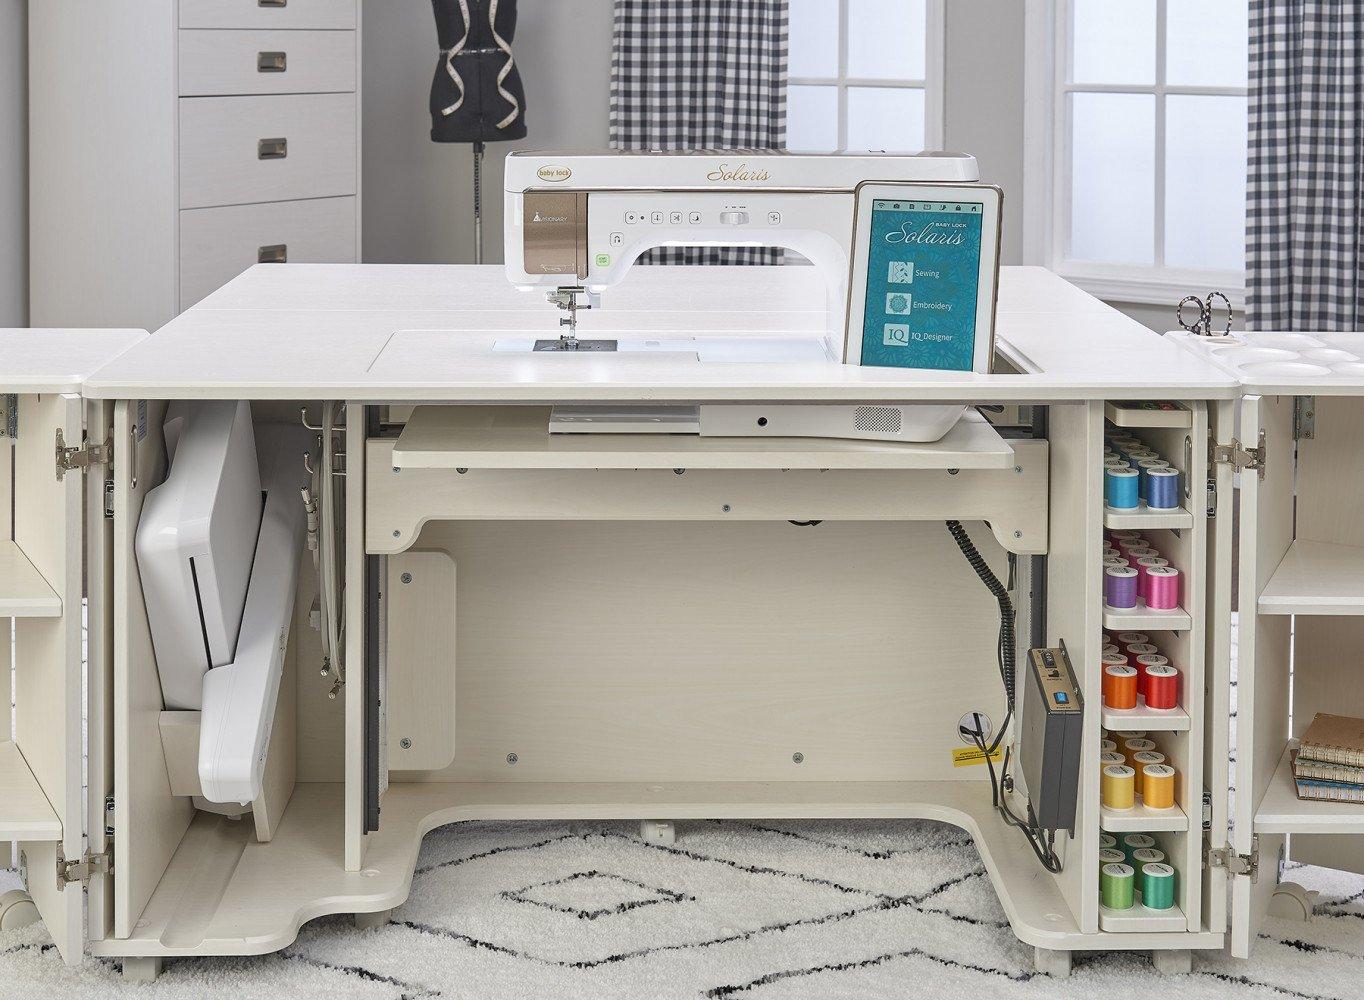 Koala Artisan Slimline Embroidery Studio